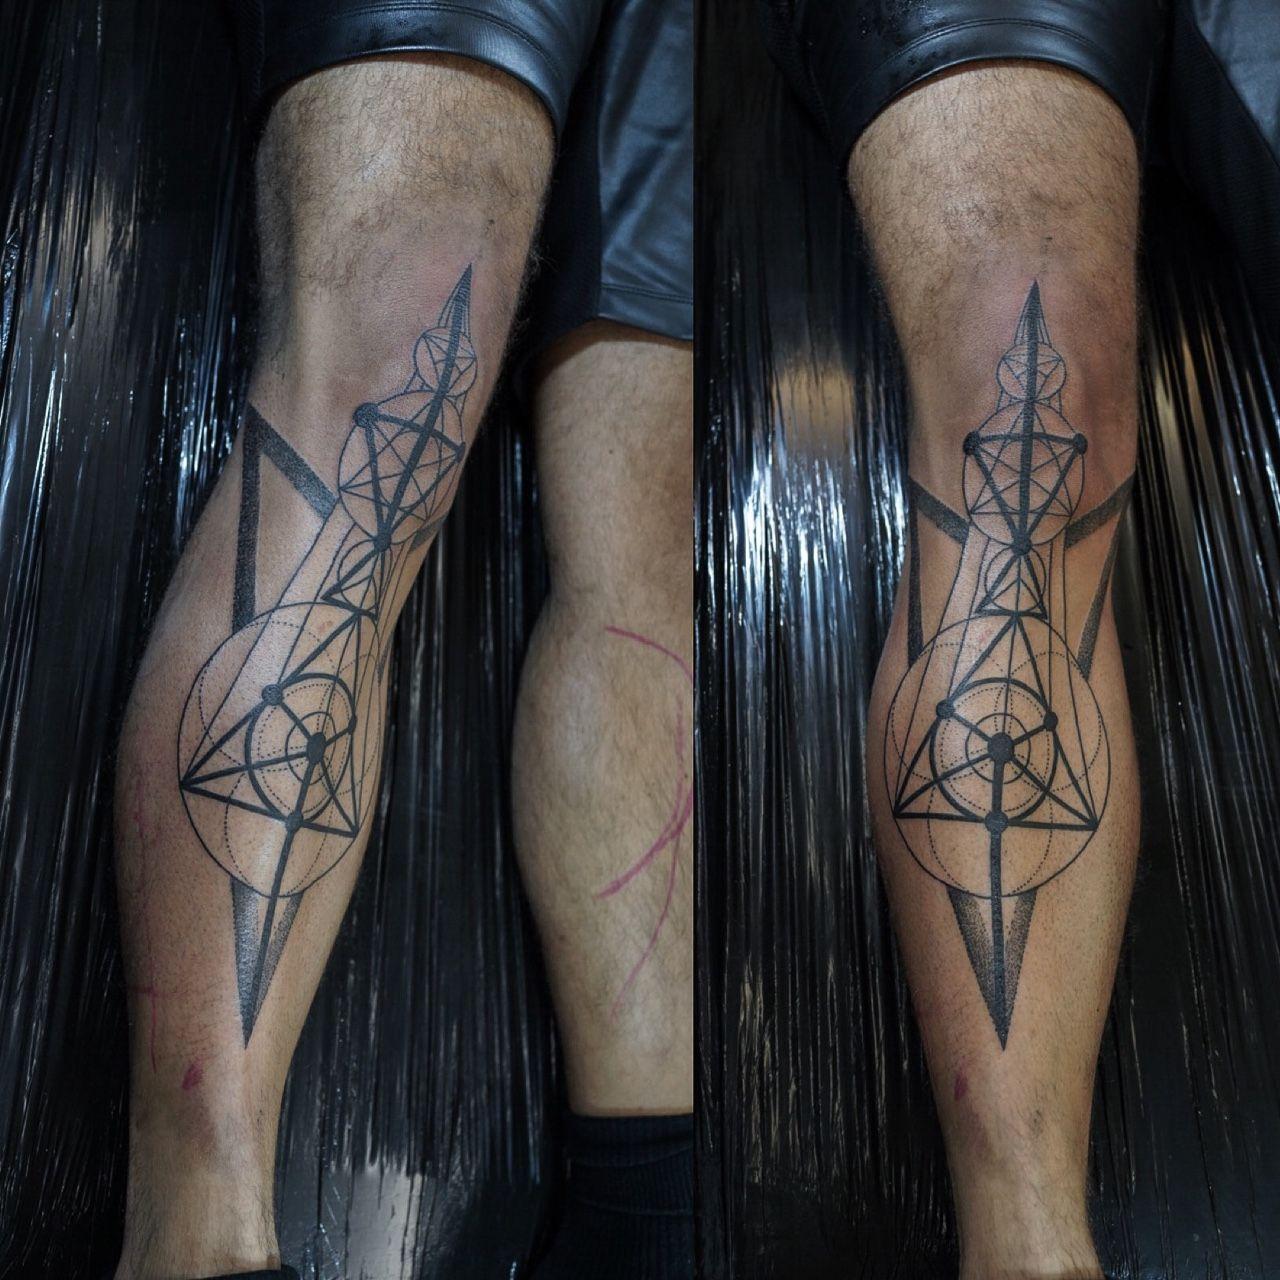 Mxm ttt sbldn tattoos satanic tattoos ink link